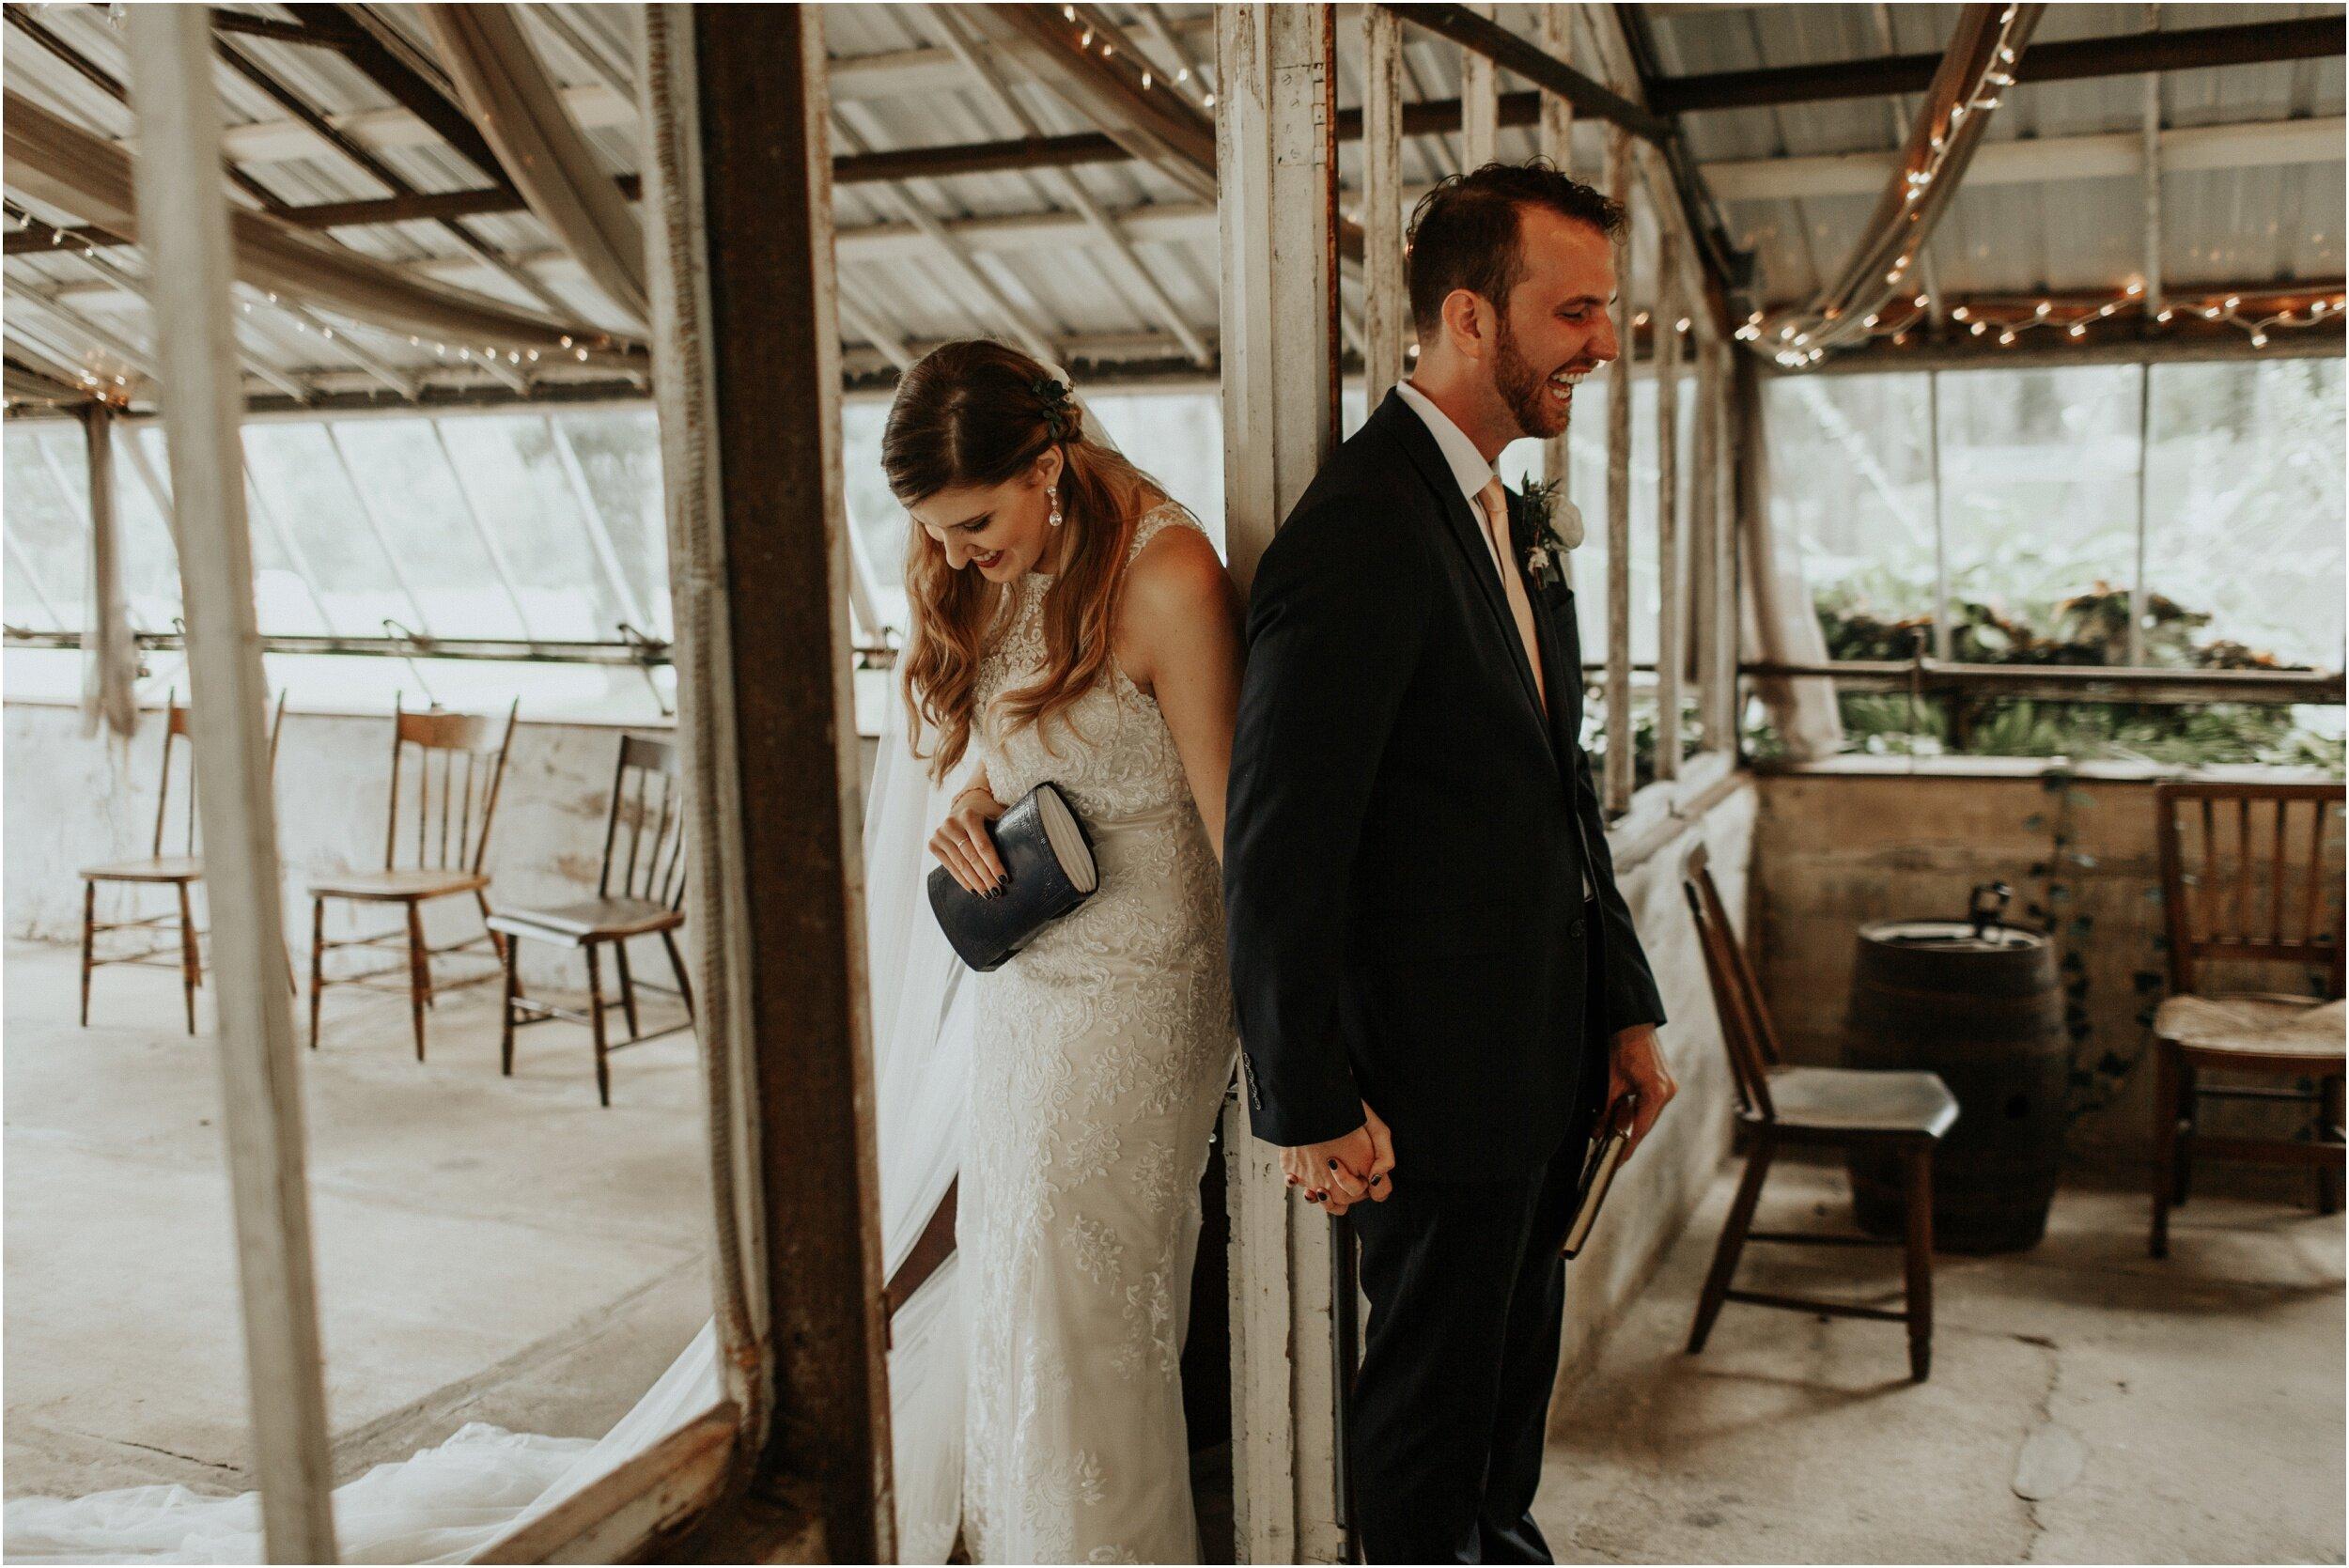 steph-and-jordan-cox-our-wedding-historic-shady-lane-compass-wedding-collective-hazel-lining-photography-destination-elopement-wedding-engagement-photography_0029.jpg